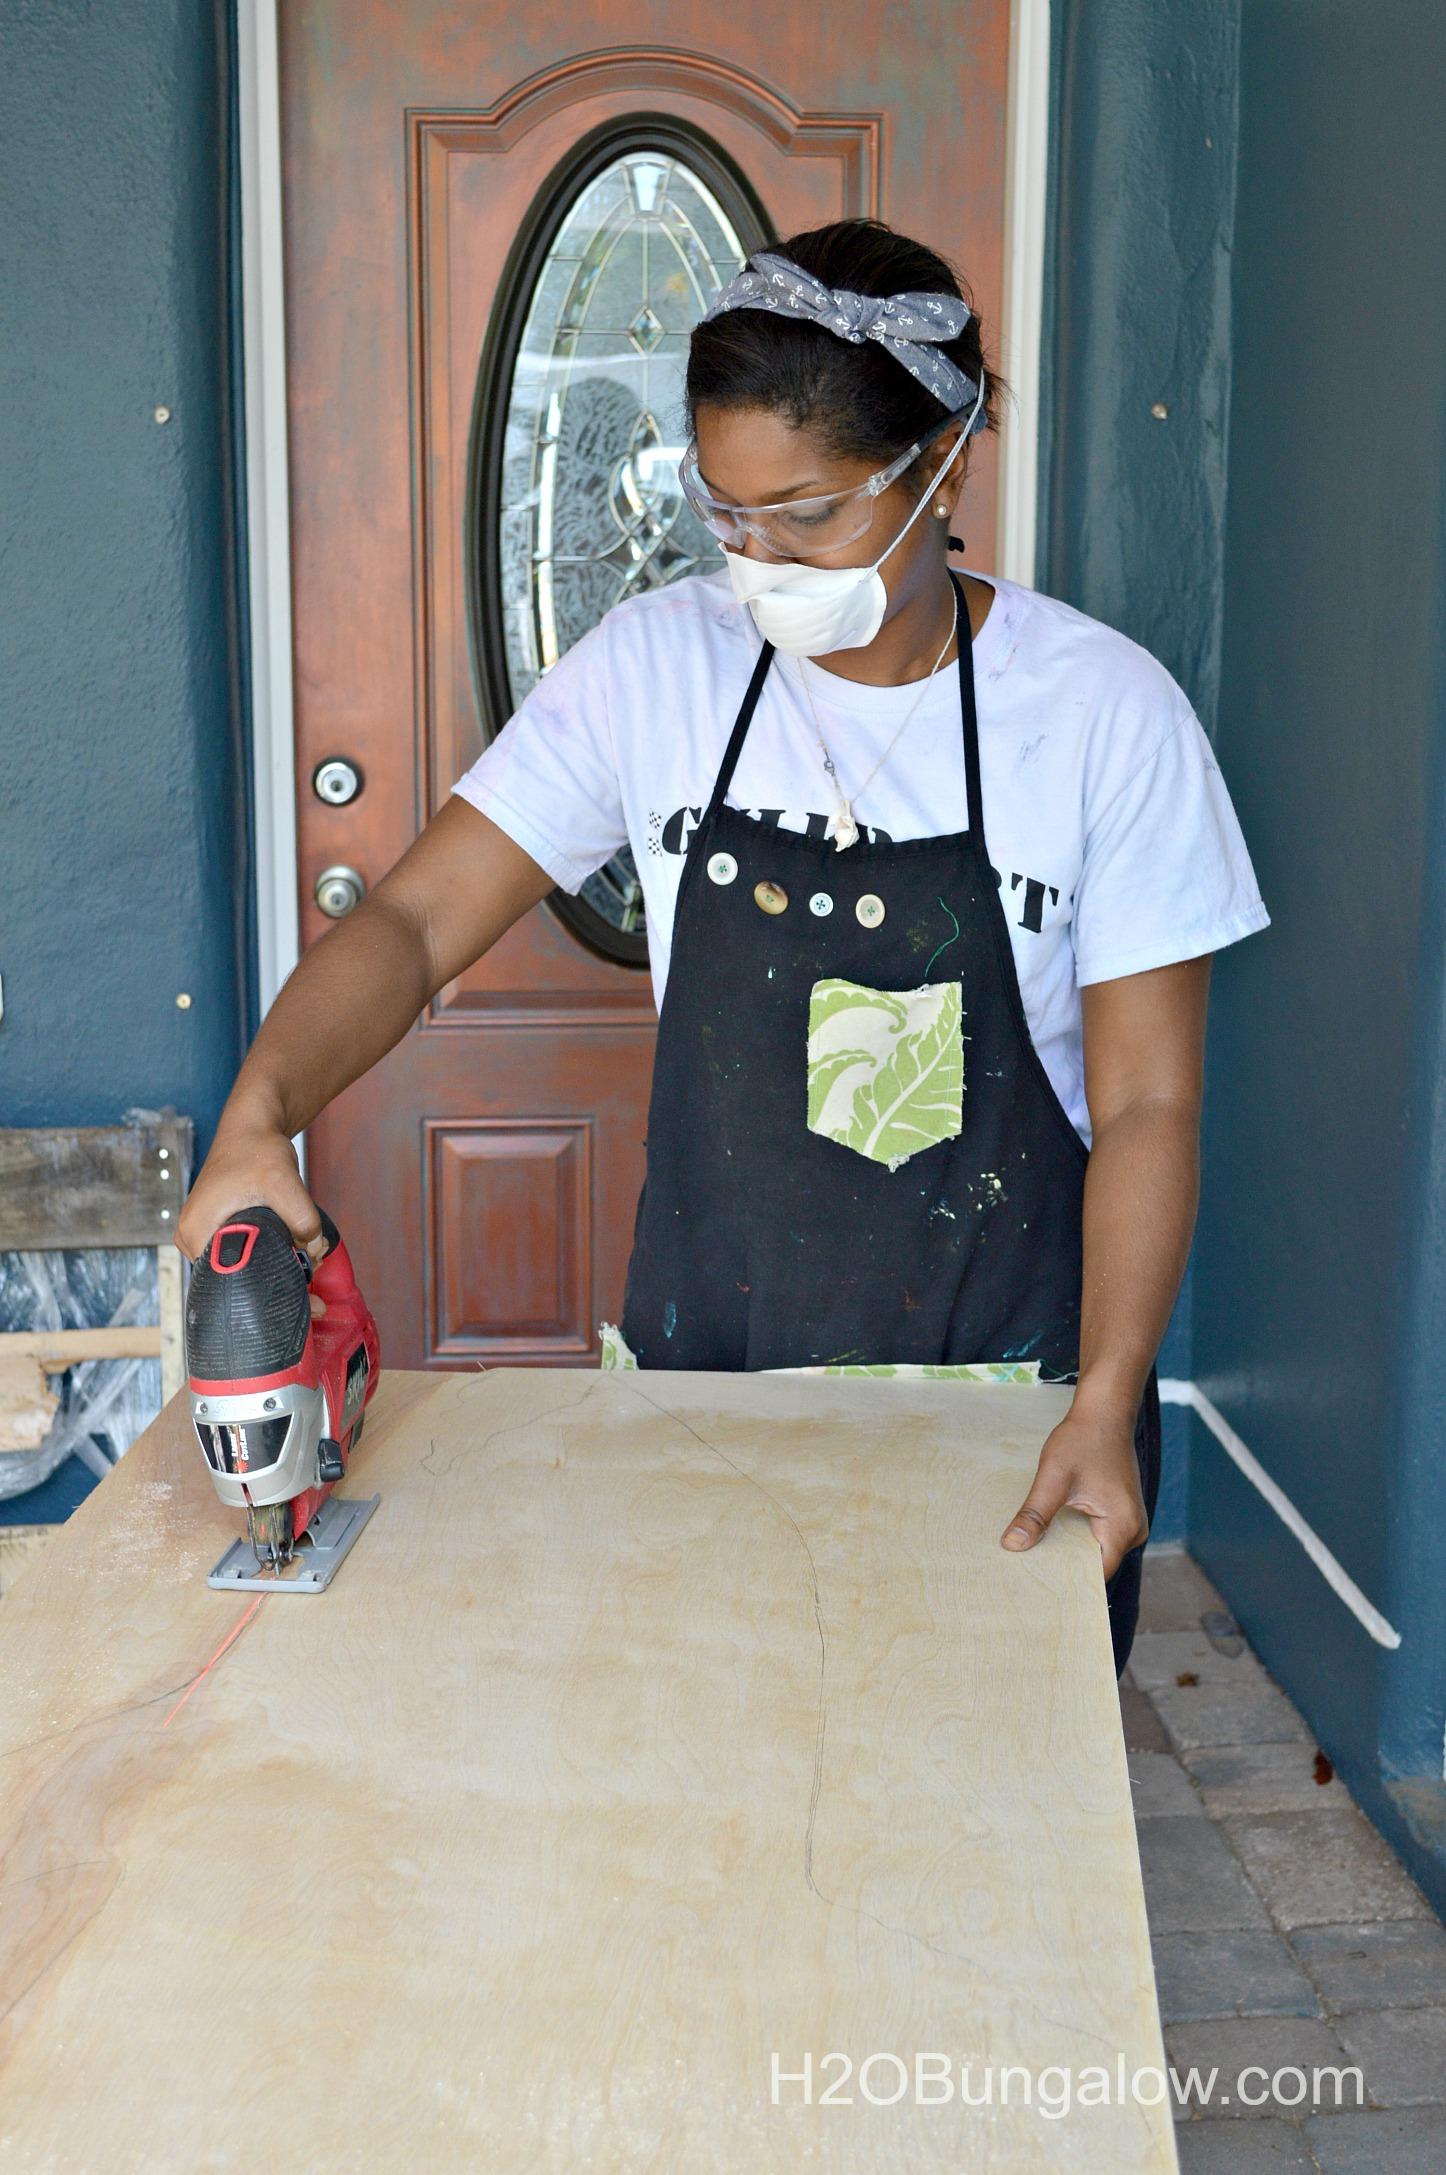 Cutting-wood-shark-H2OBungalow